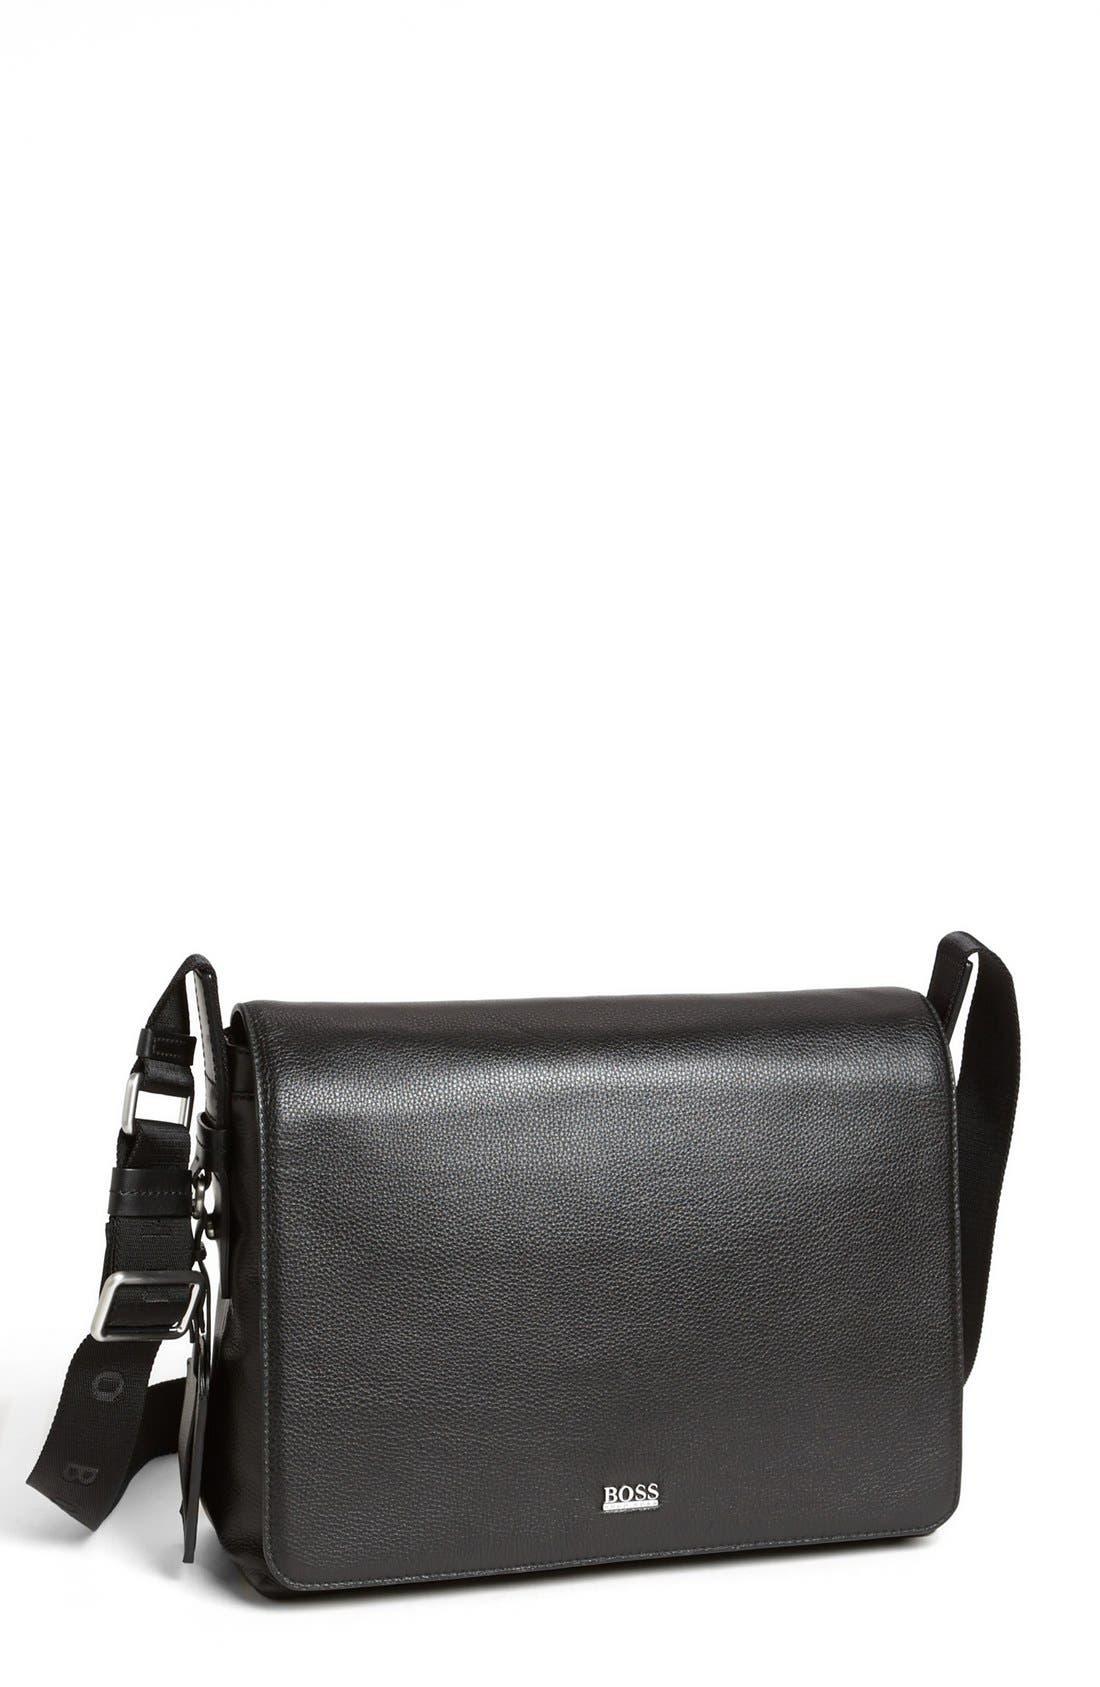 HUGO BOSS 'Barter' Leather Messenger Bag,                             Main thumbnail 1, color,                             001